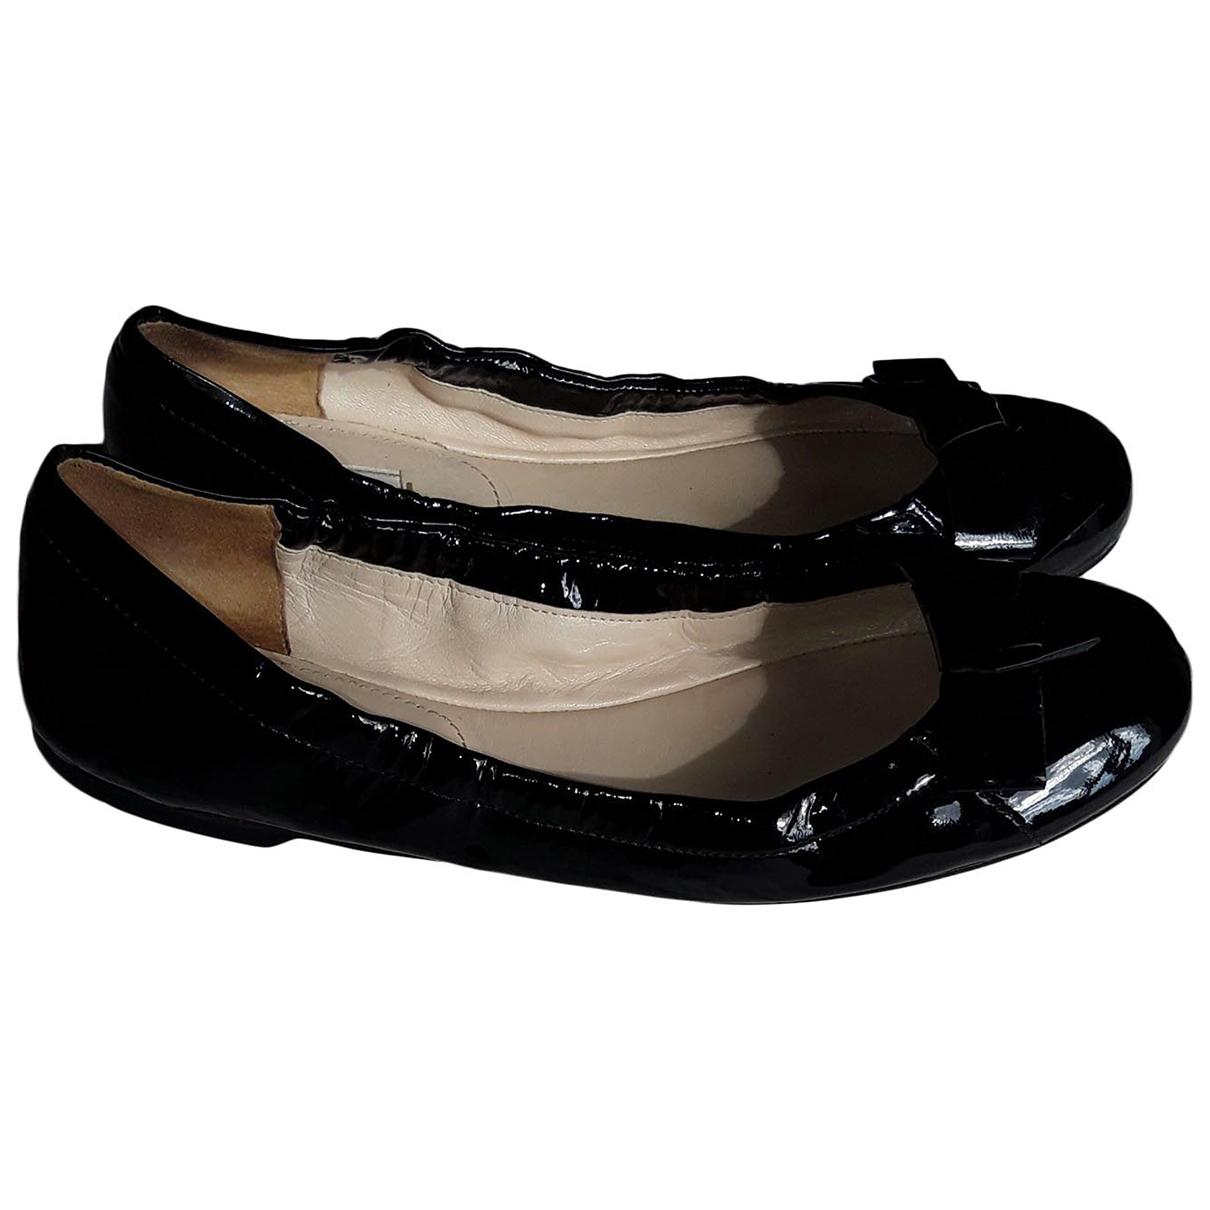 Prada \N Black Patent leather Ballet flats for Women 39.5 EU